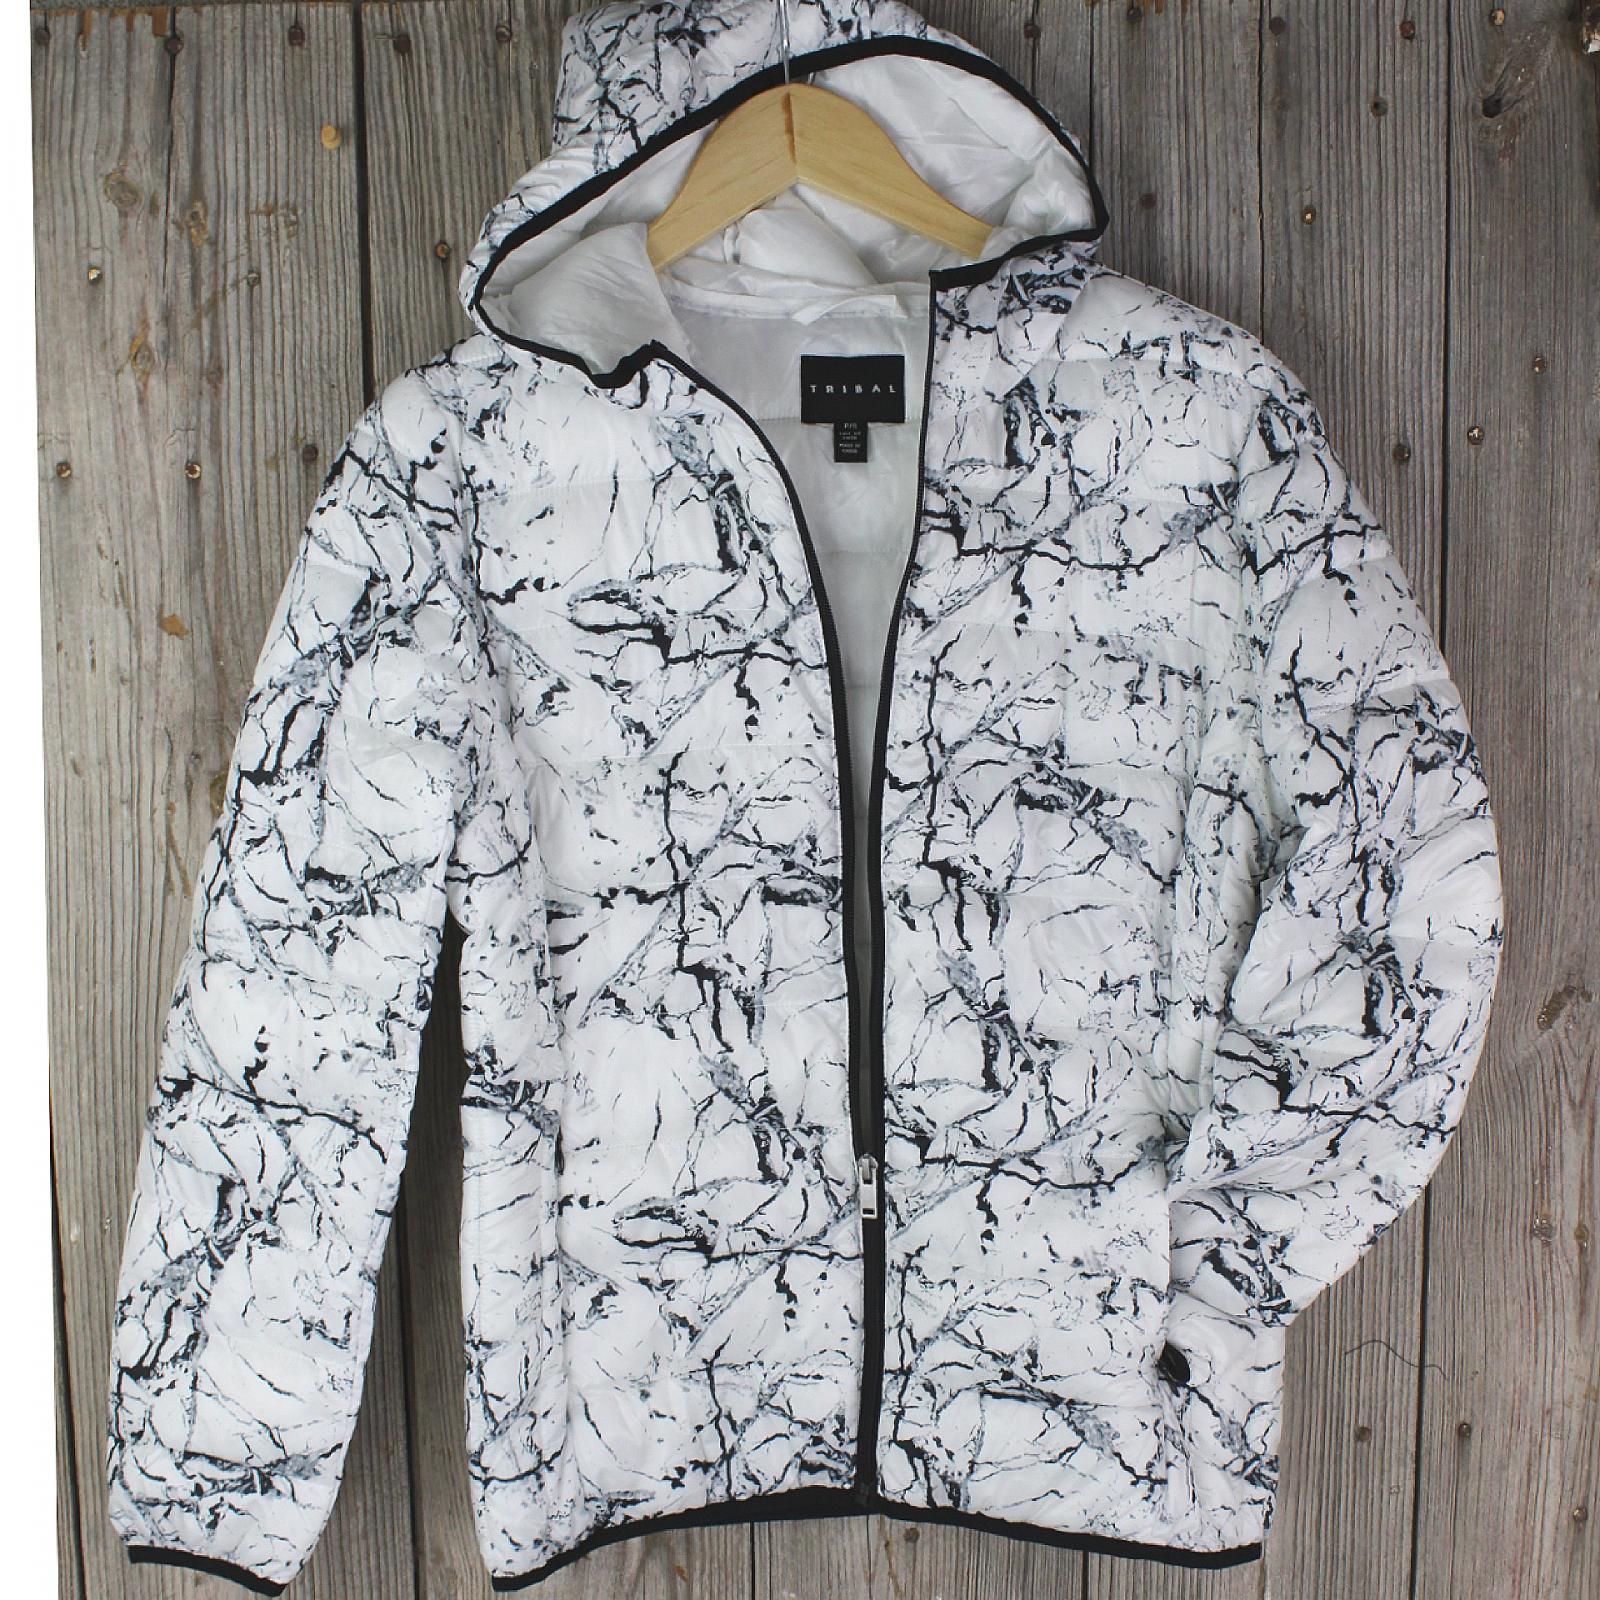 Black & White Puffer Hooded Jacket from Tribal